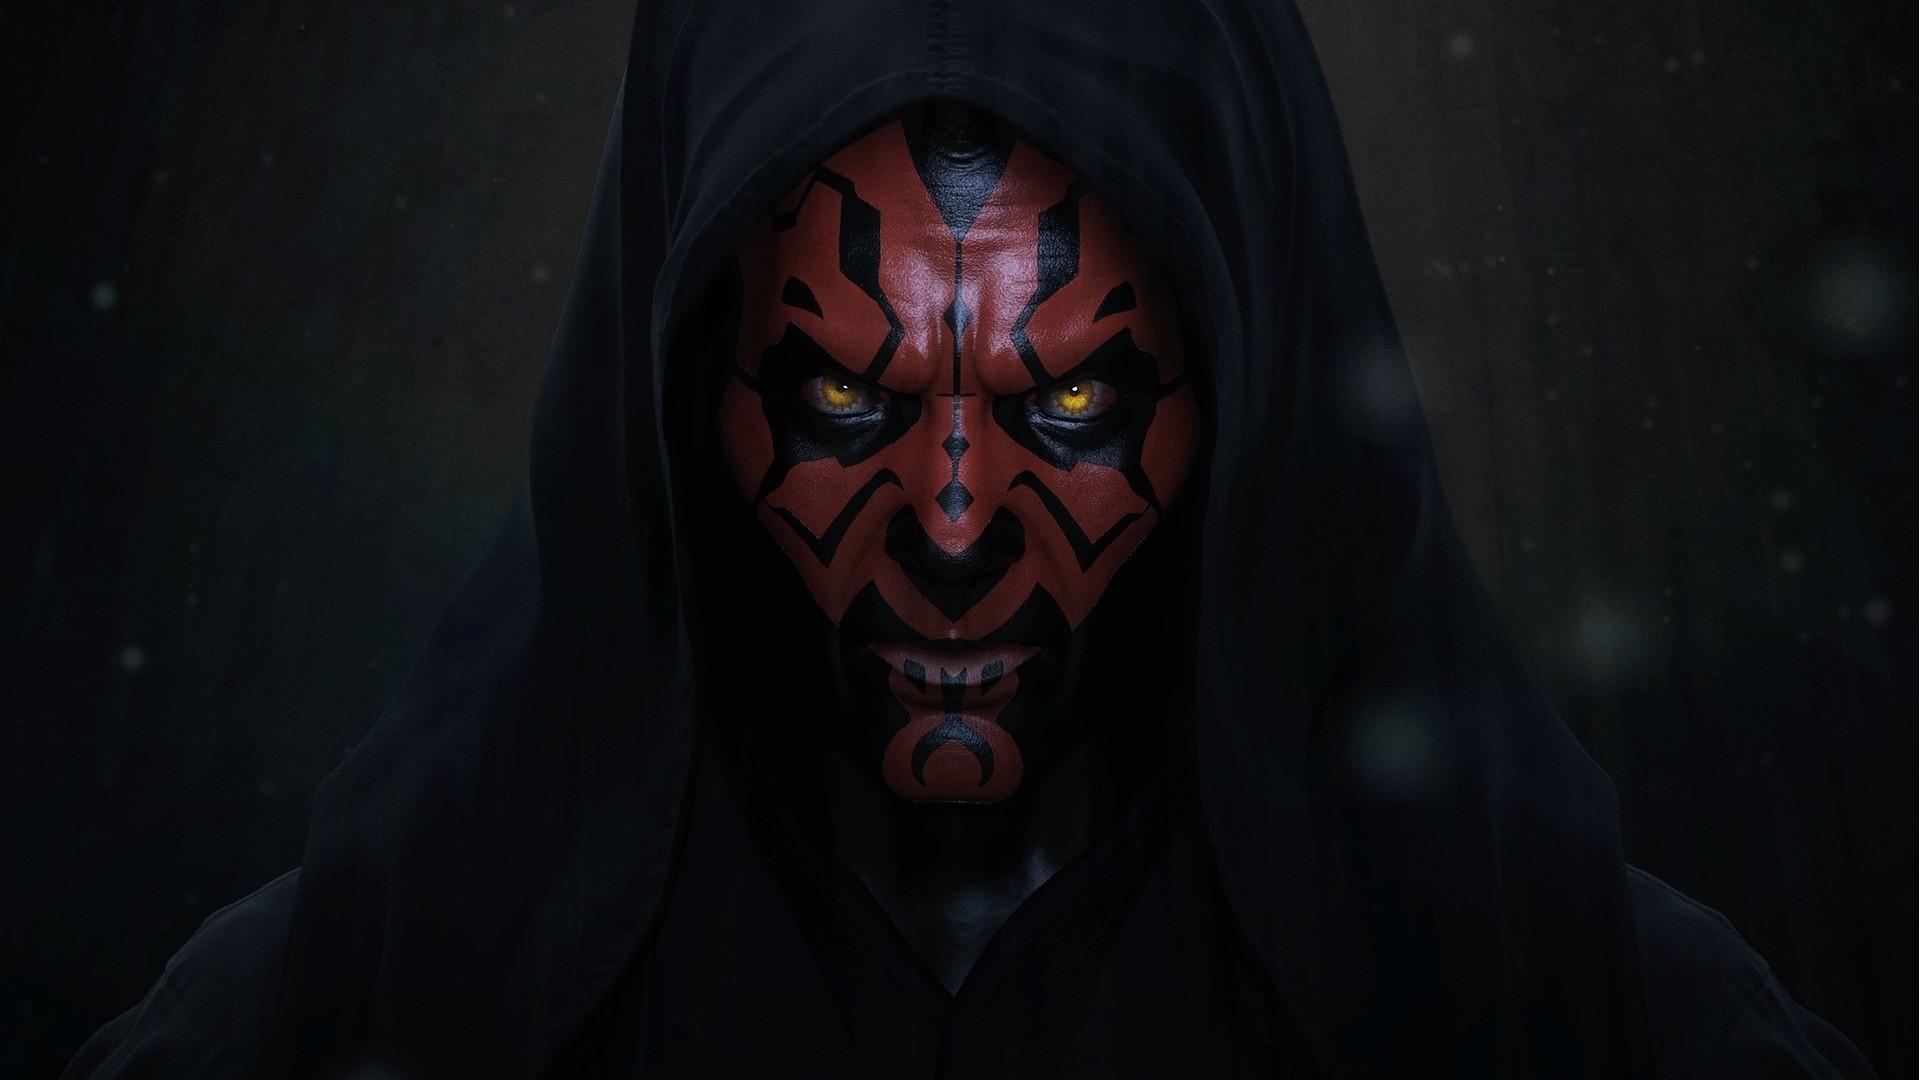 Res: 1920x1080, Star Wars, Starwars, The Sith Lord, Darth Maul, Darth Maul Art Sith